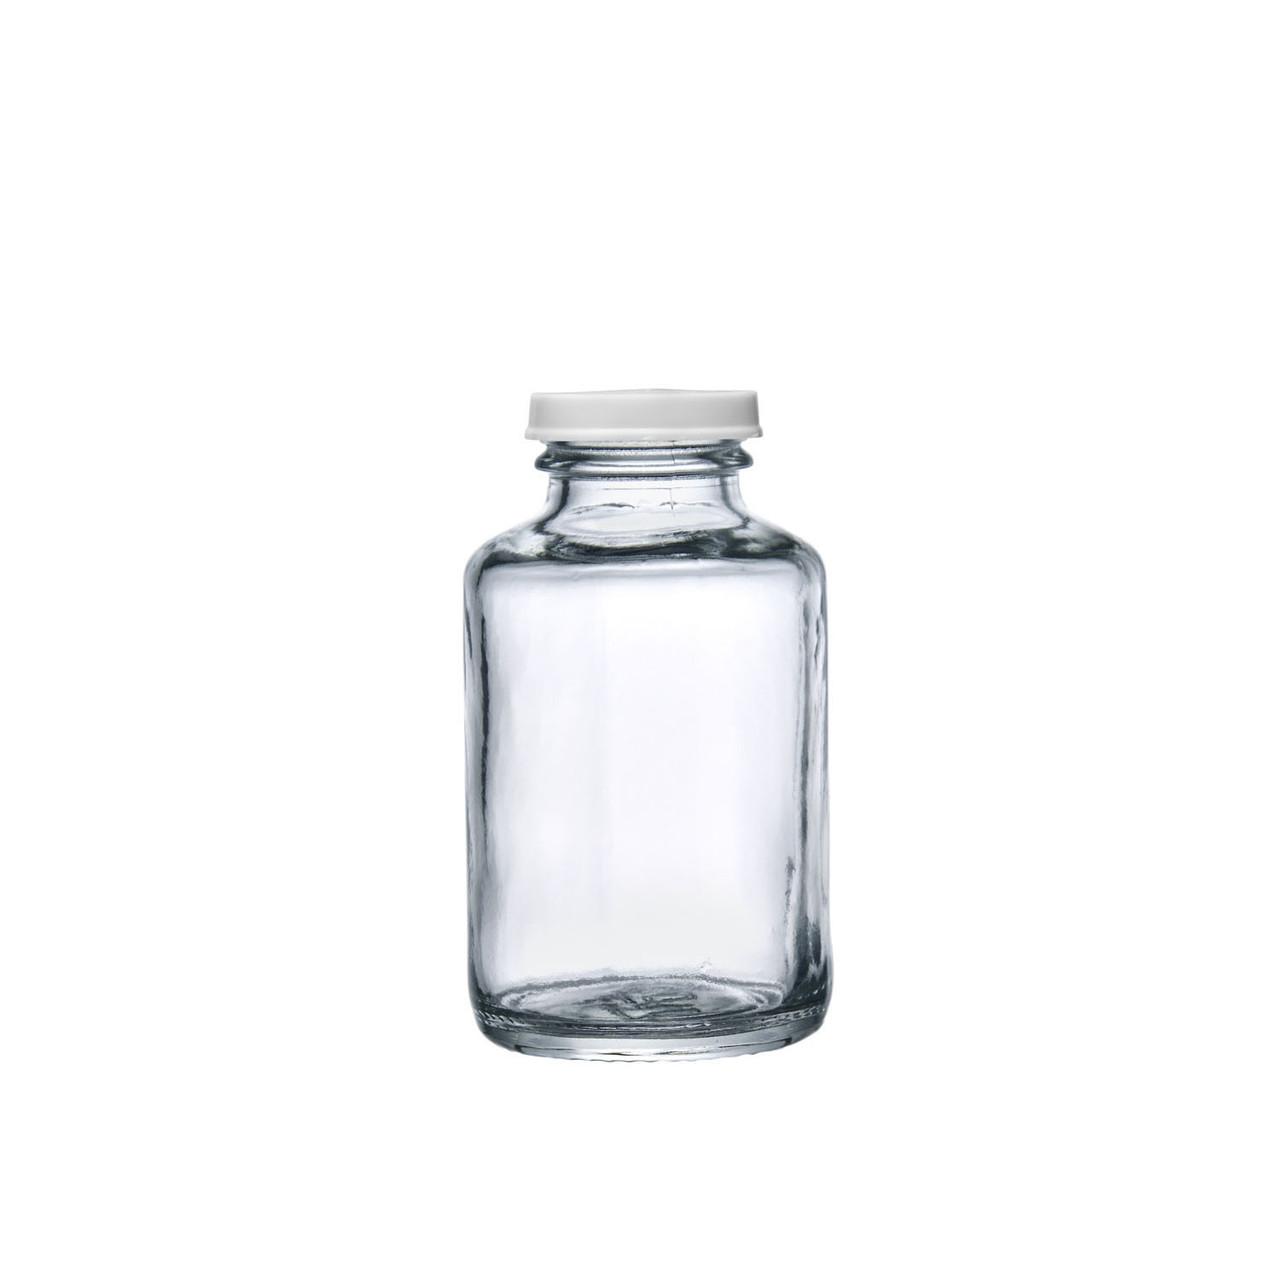 G7.10 - 30mL glass jar with plastic cap